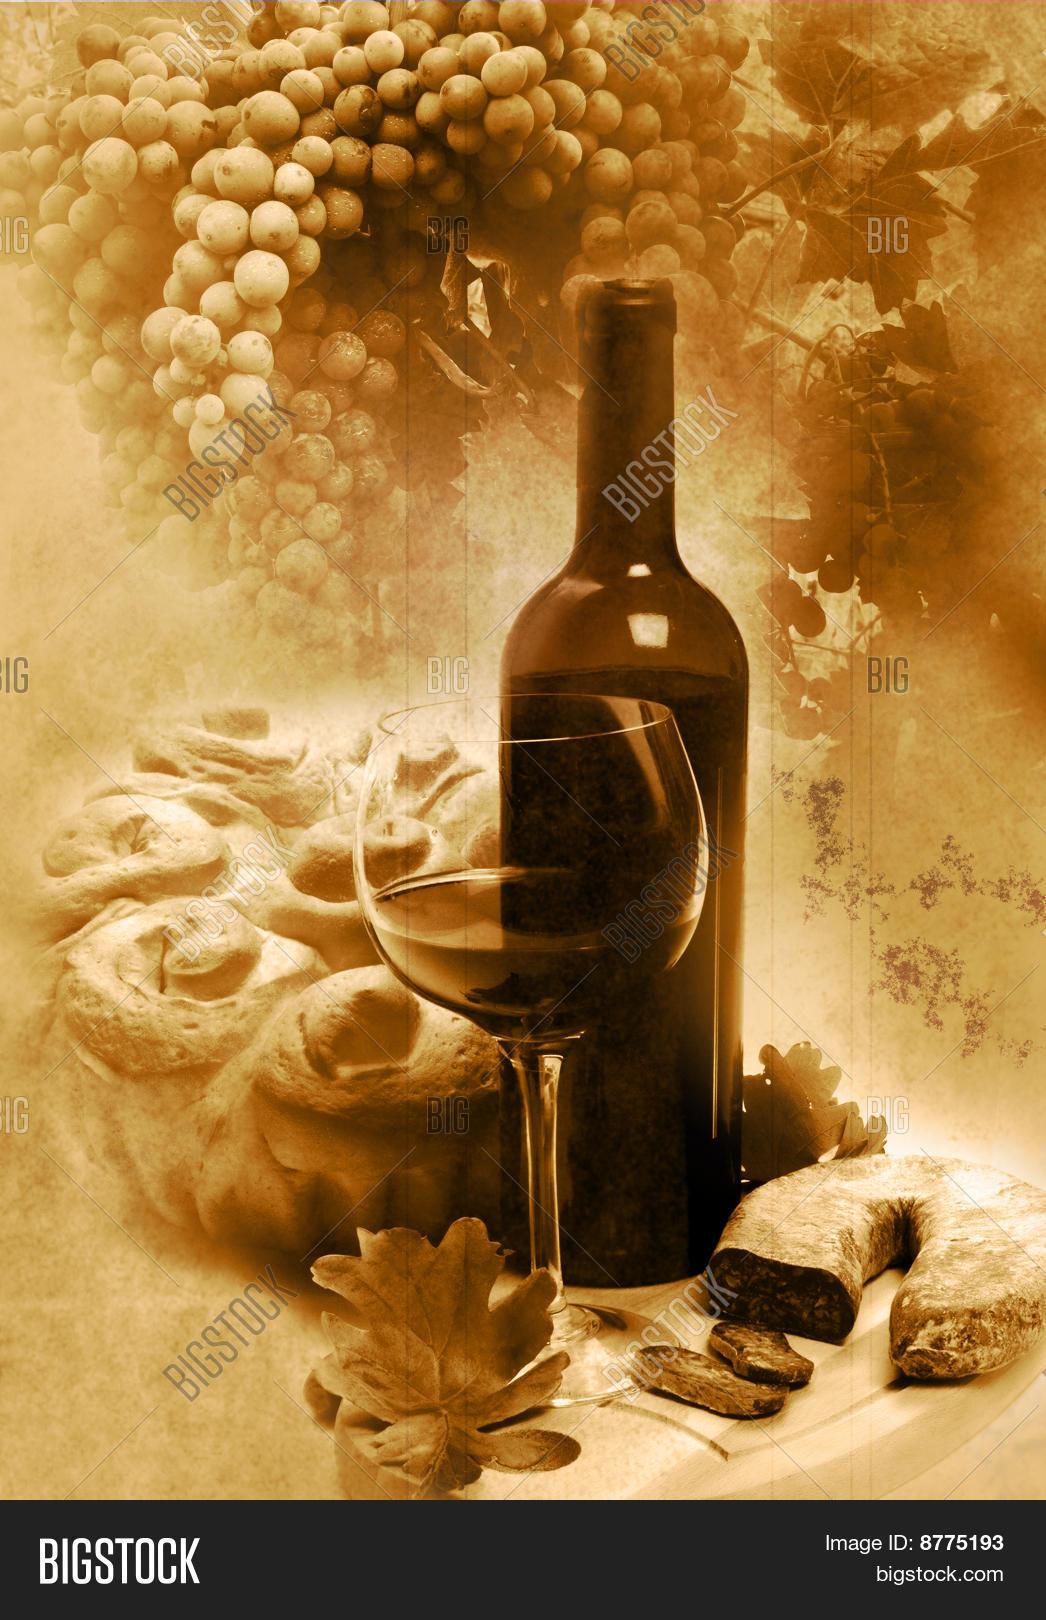 Vintage Wine Background Image & Photo | Bigstock